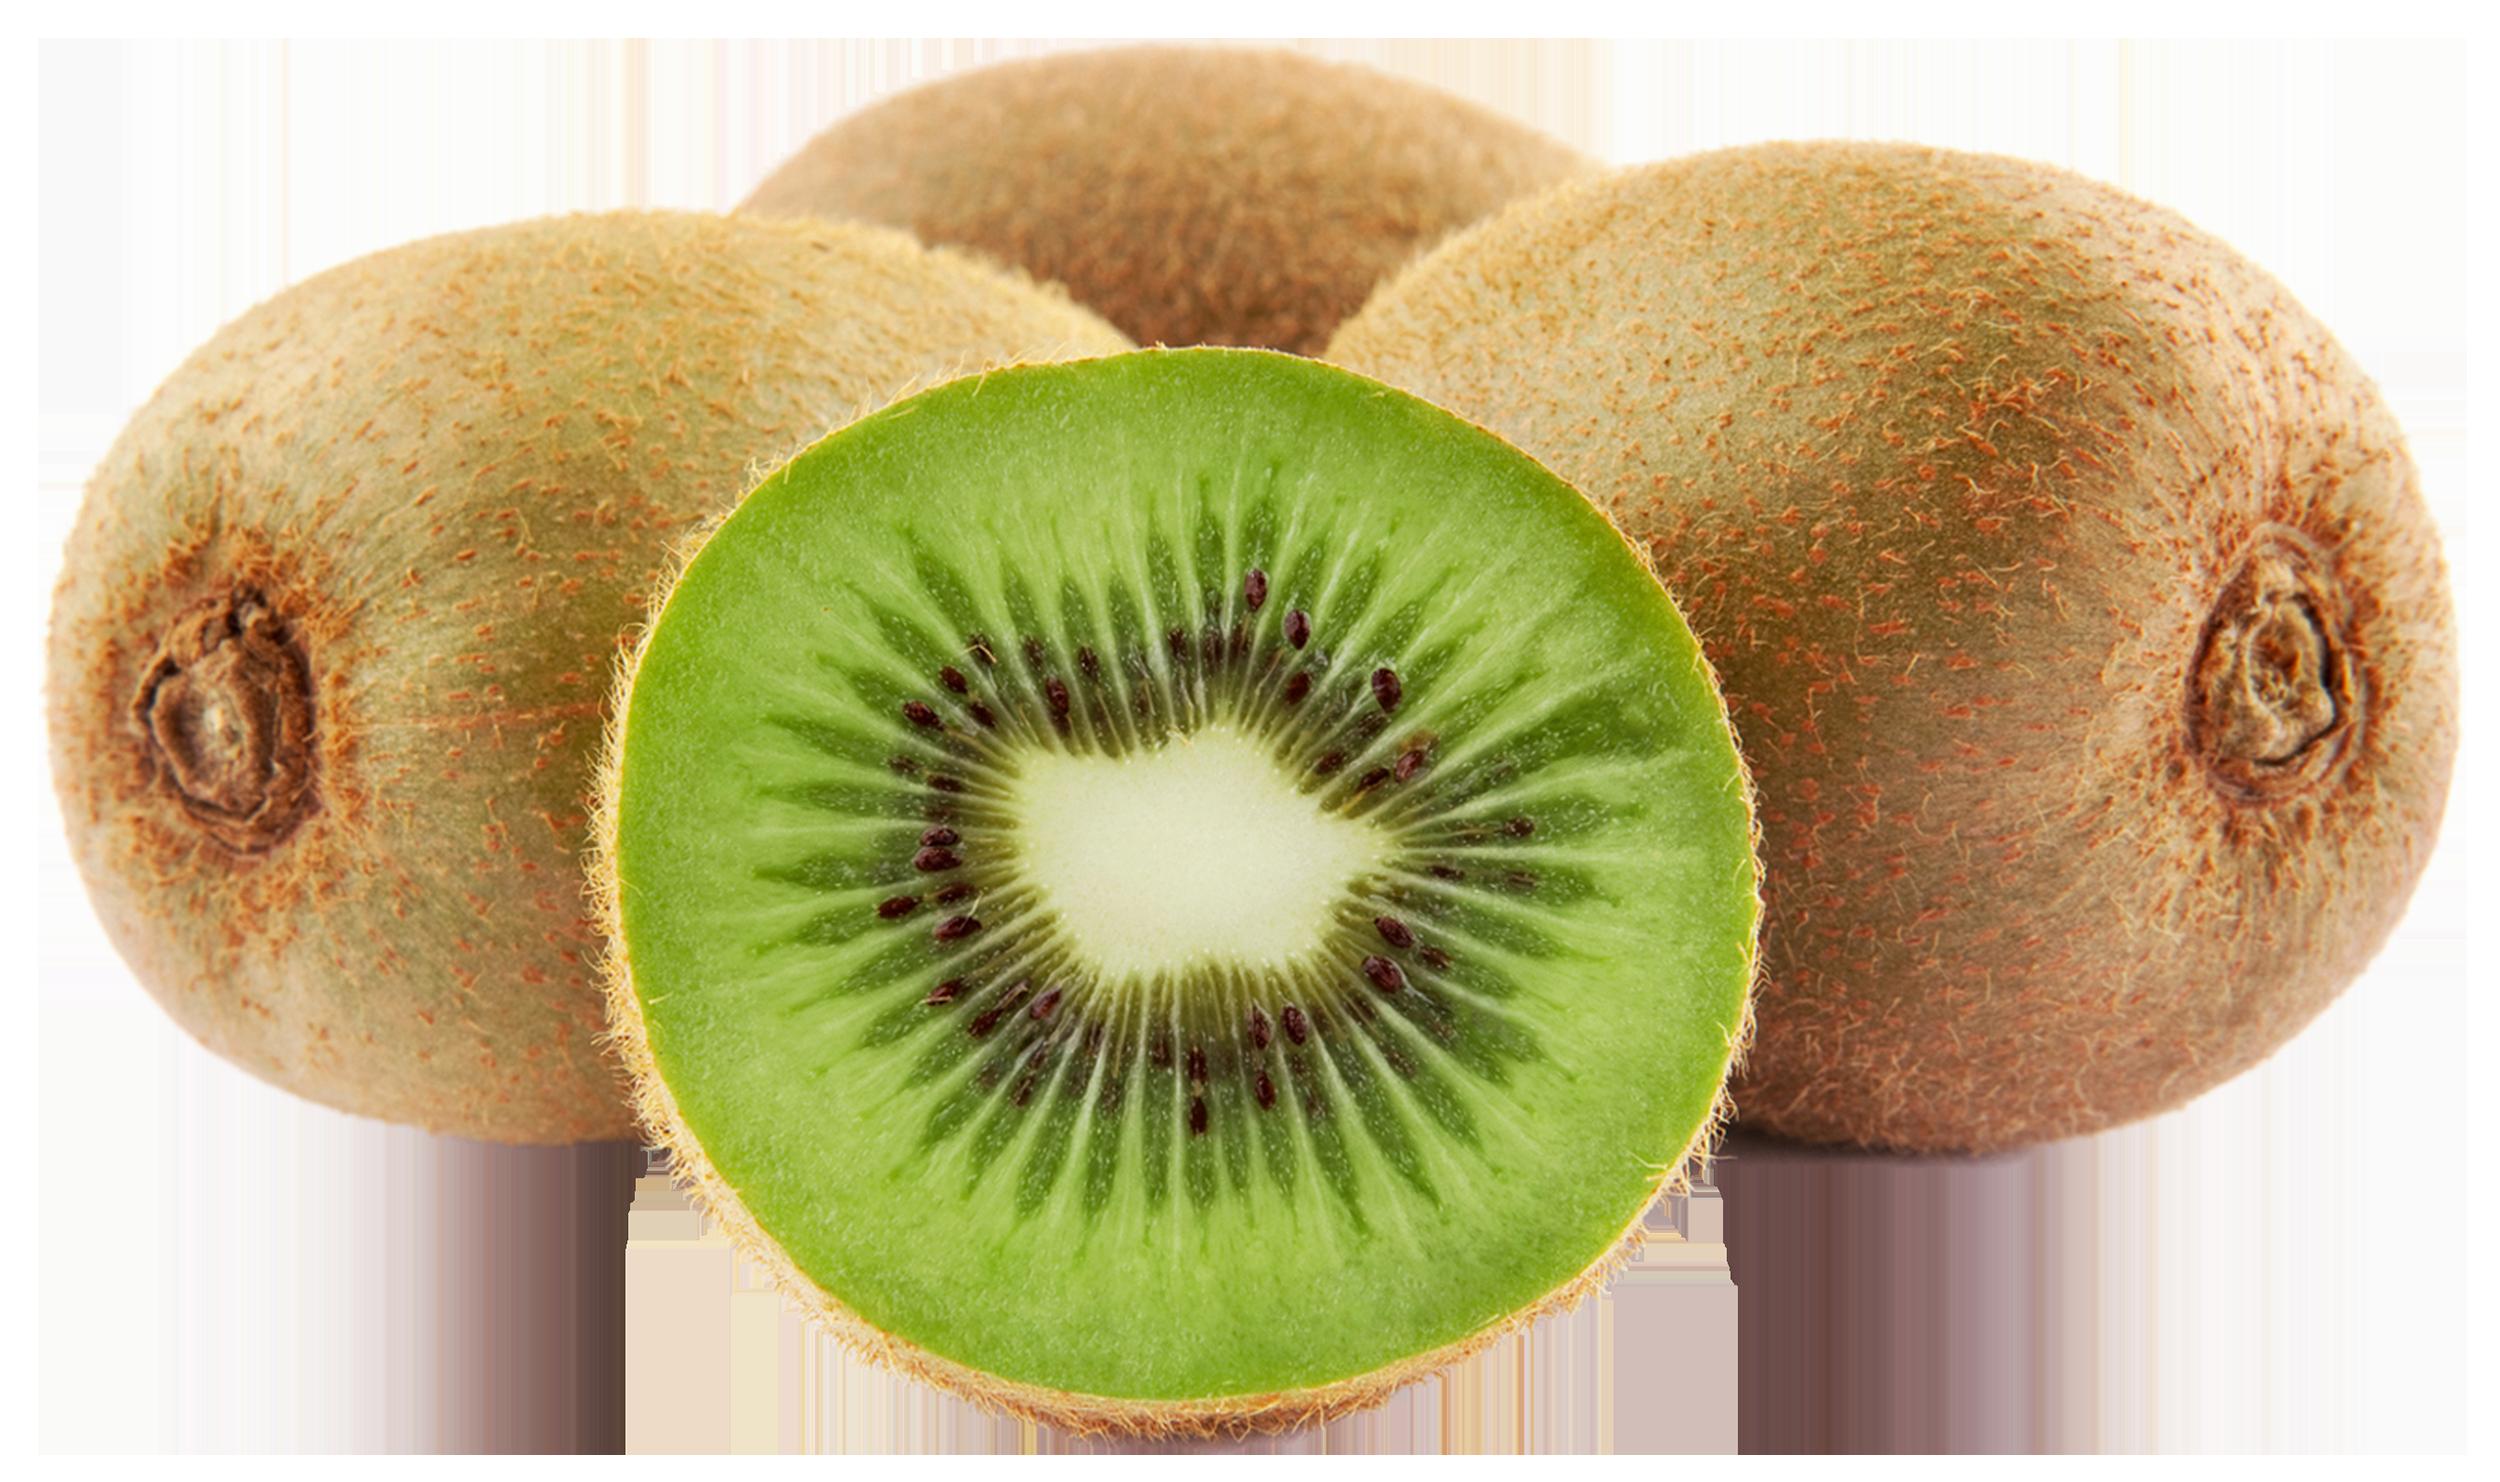 Kiwi clipart kiwi fruit. Kiwis png best web